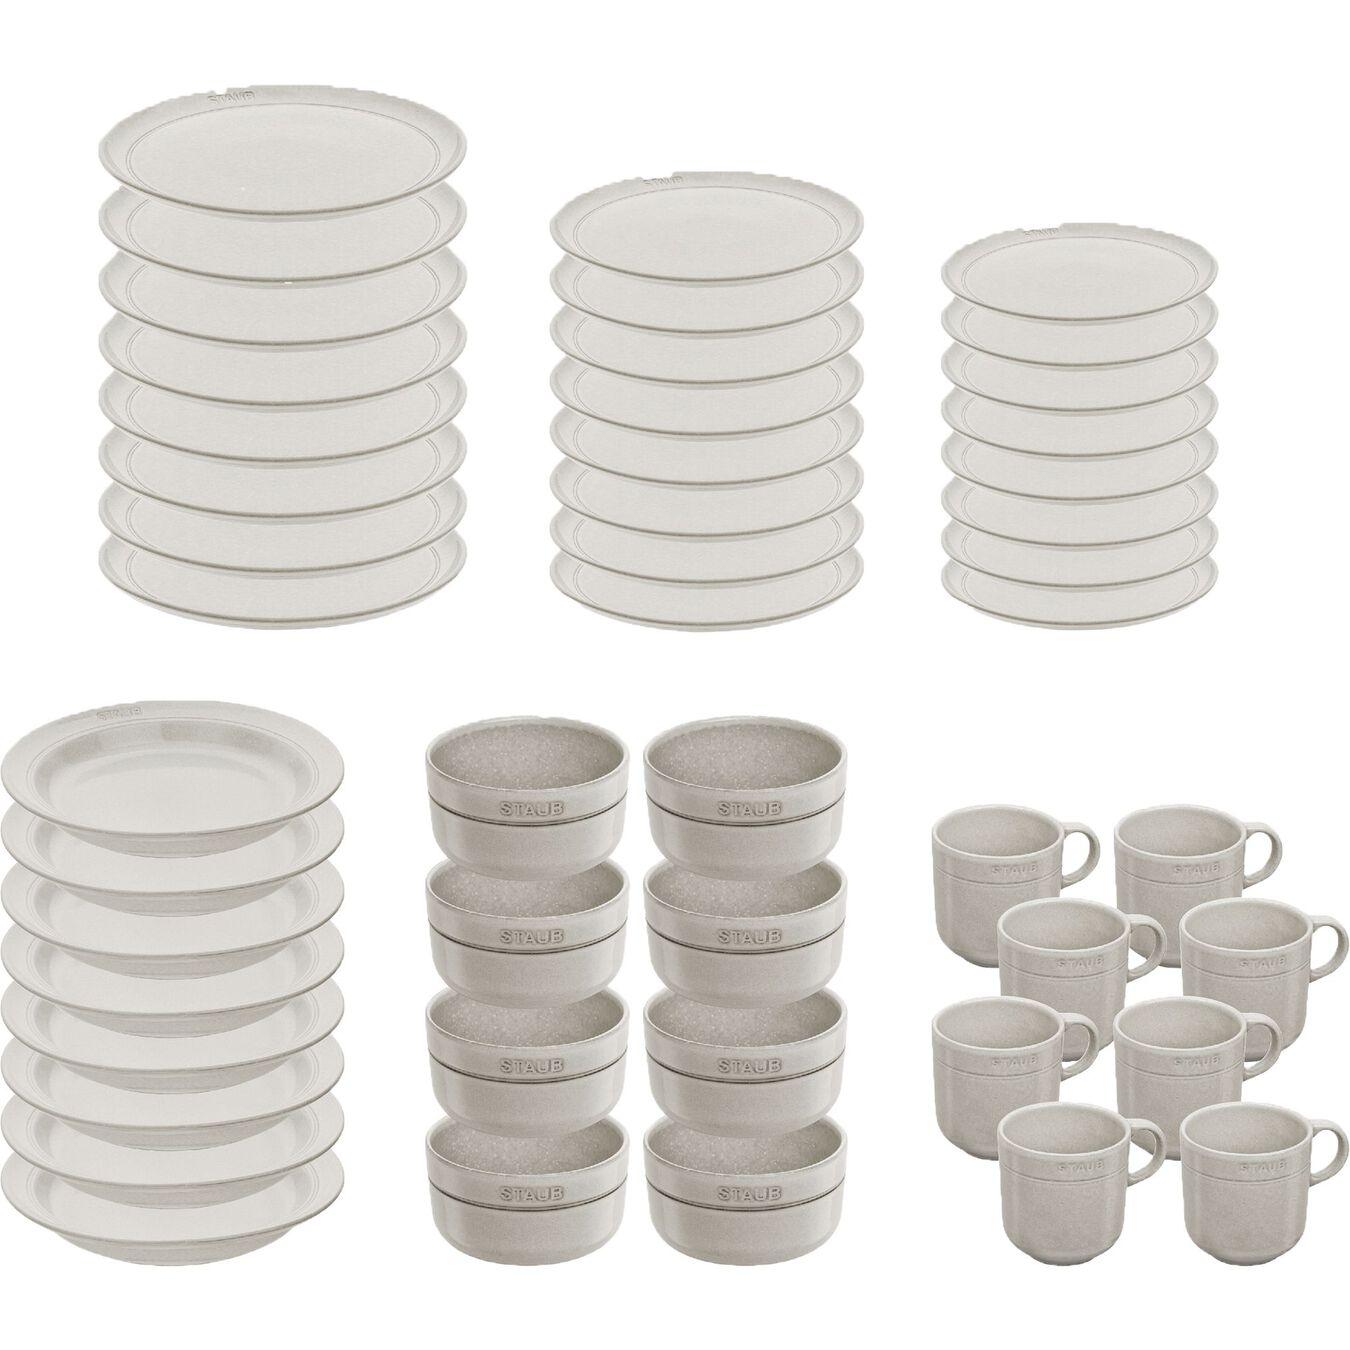 Serving set, 48 Piece   White Truffle   Ceramic   Ceramic,,large 2